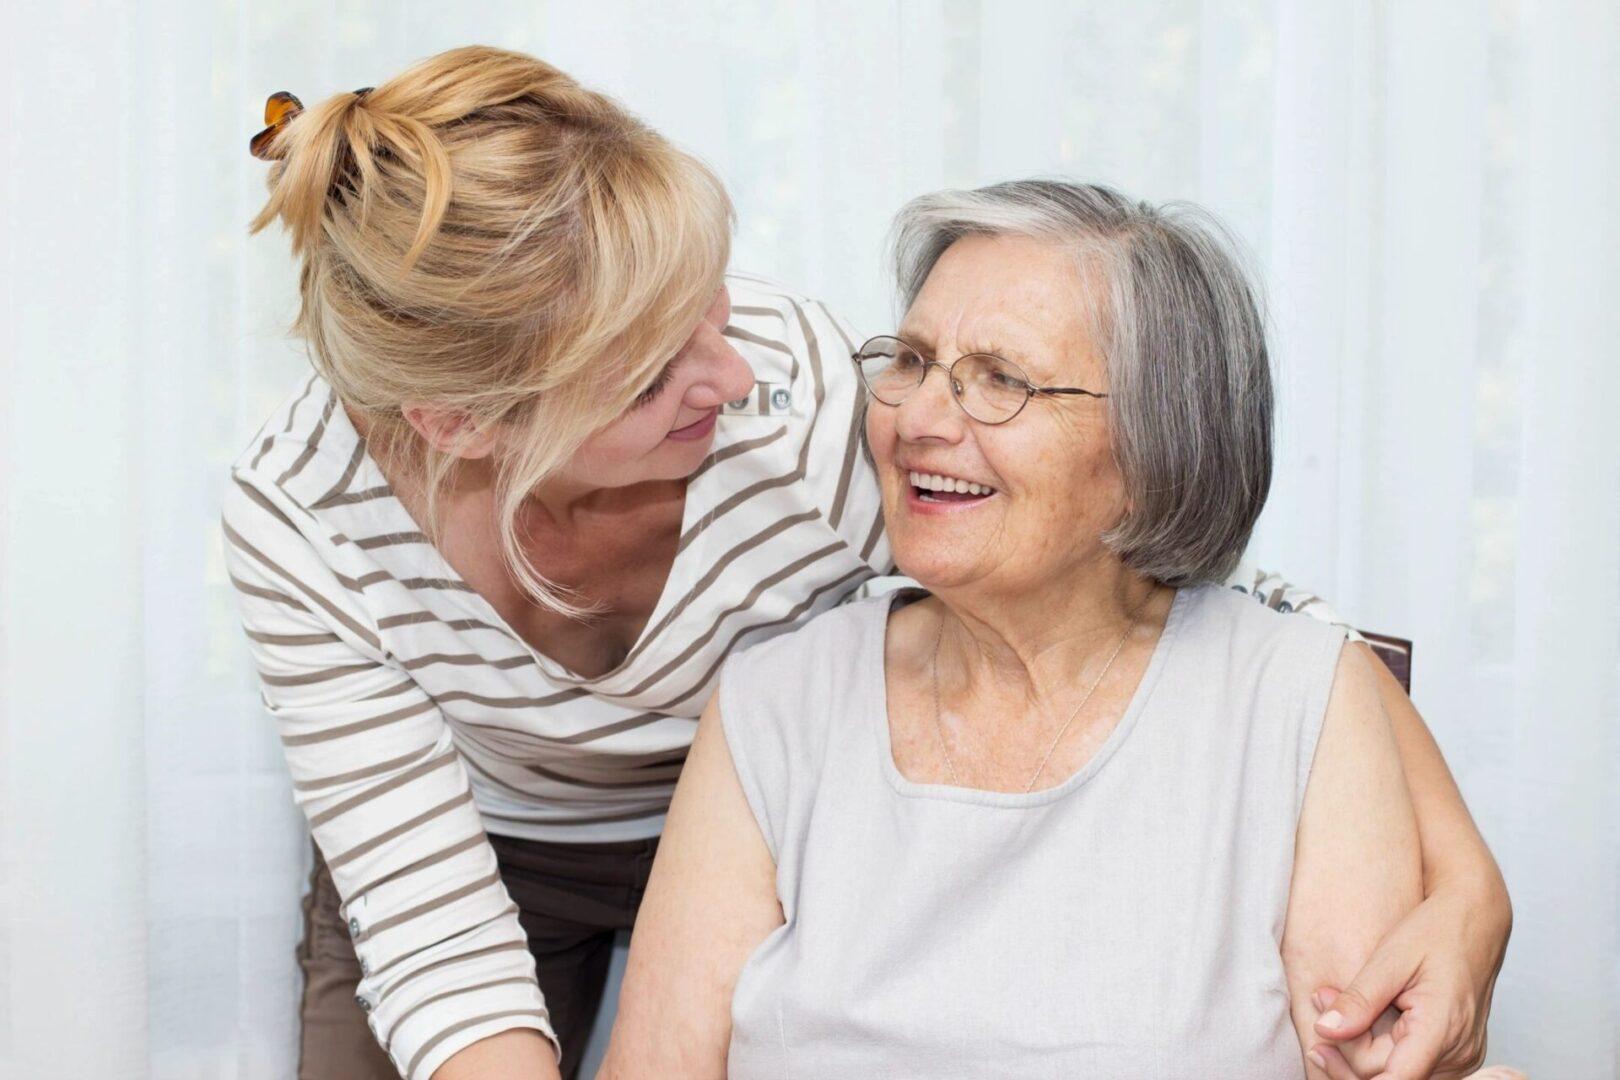 Companion and Personal Care